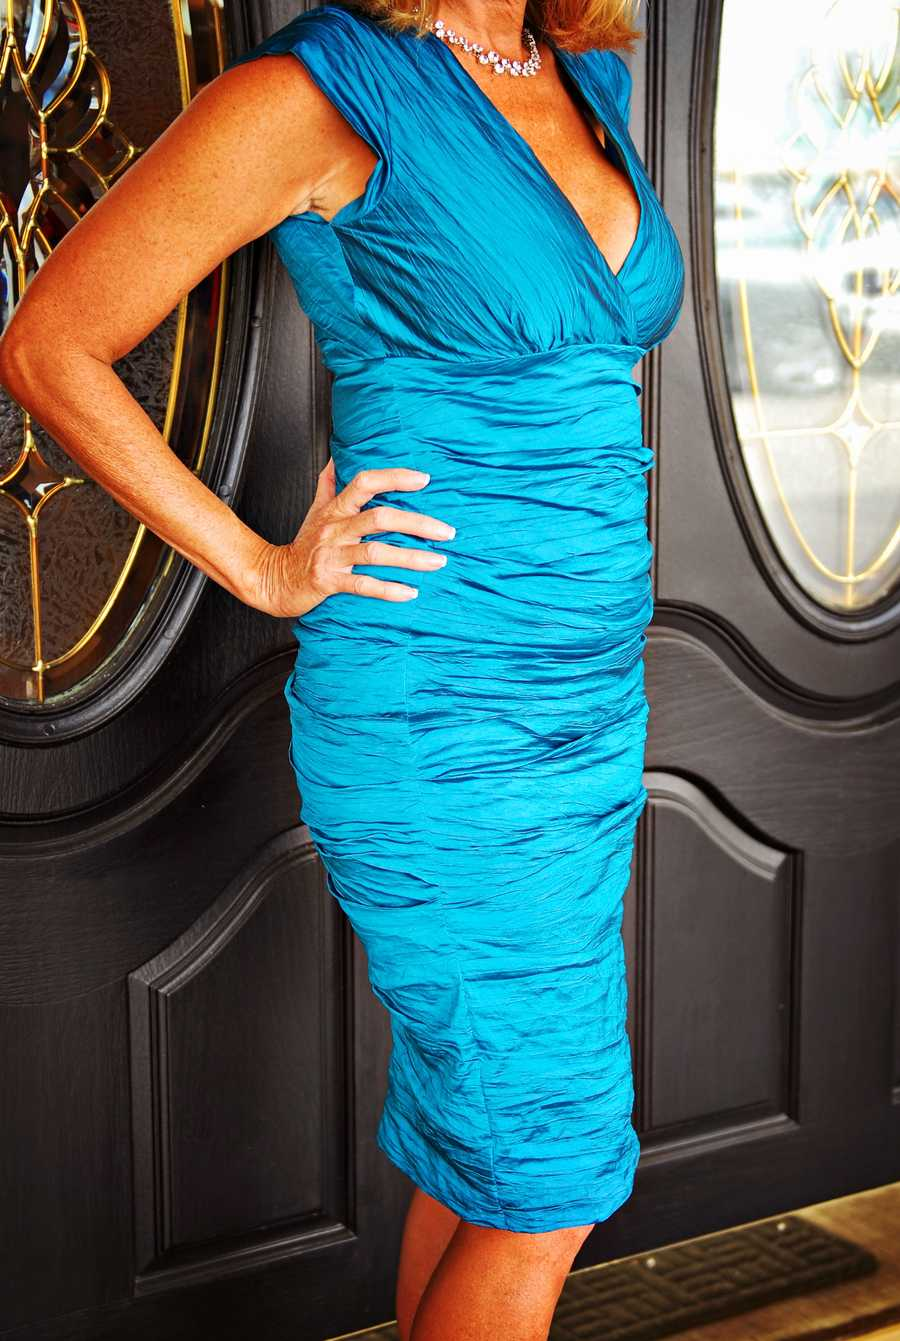 Nicole Miller peacock cap sleeve dress (Vote here)